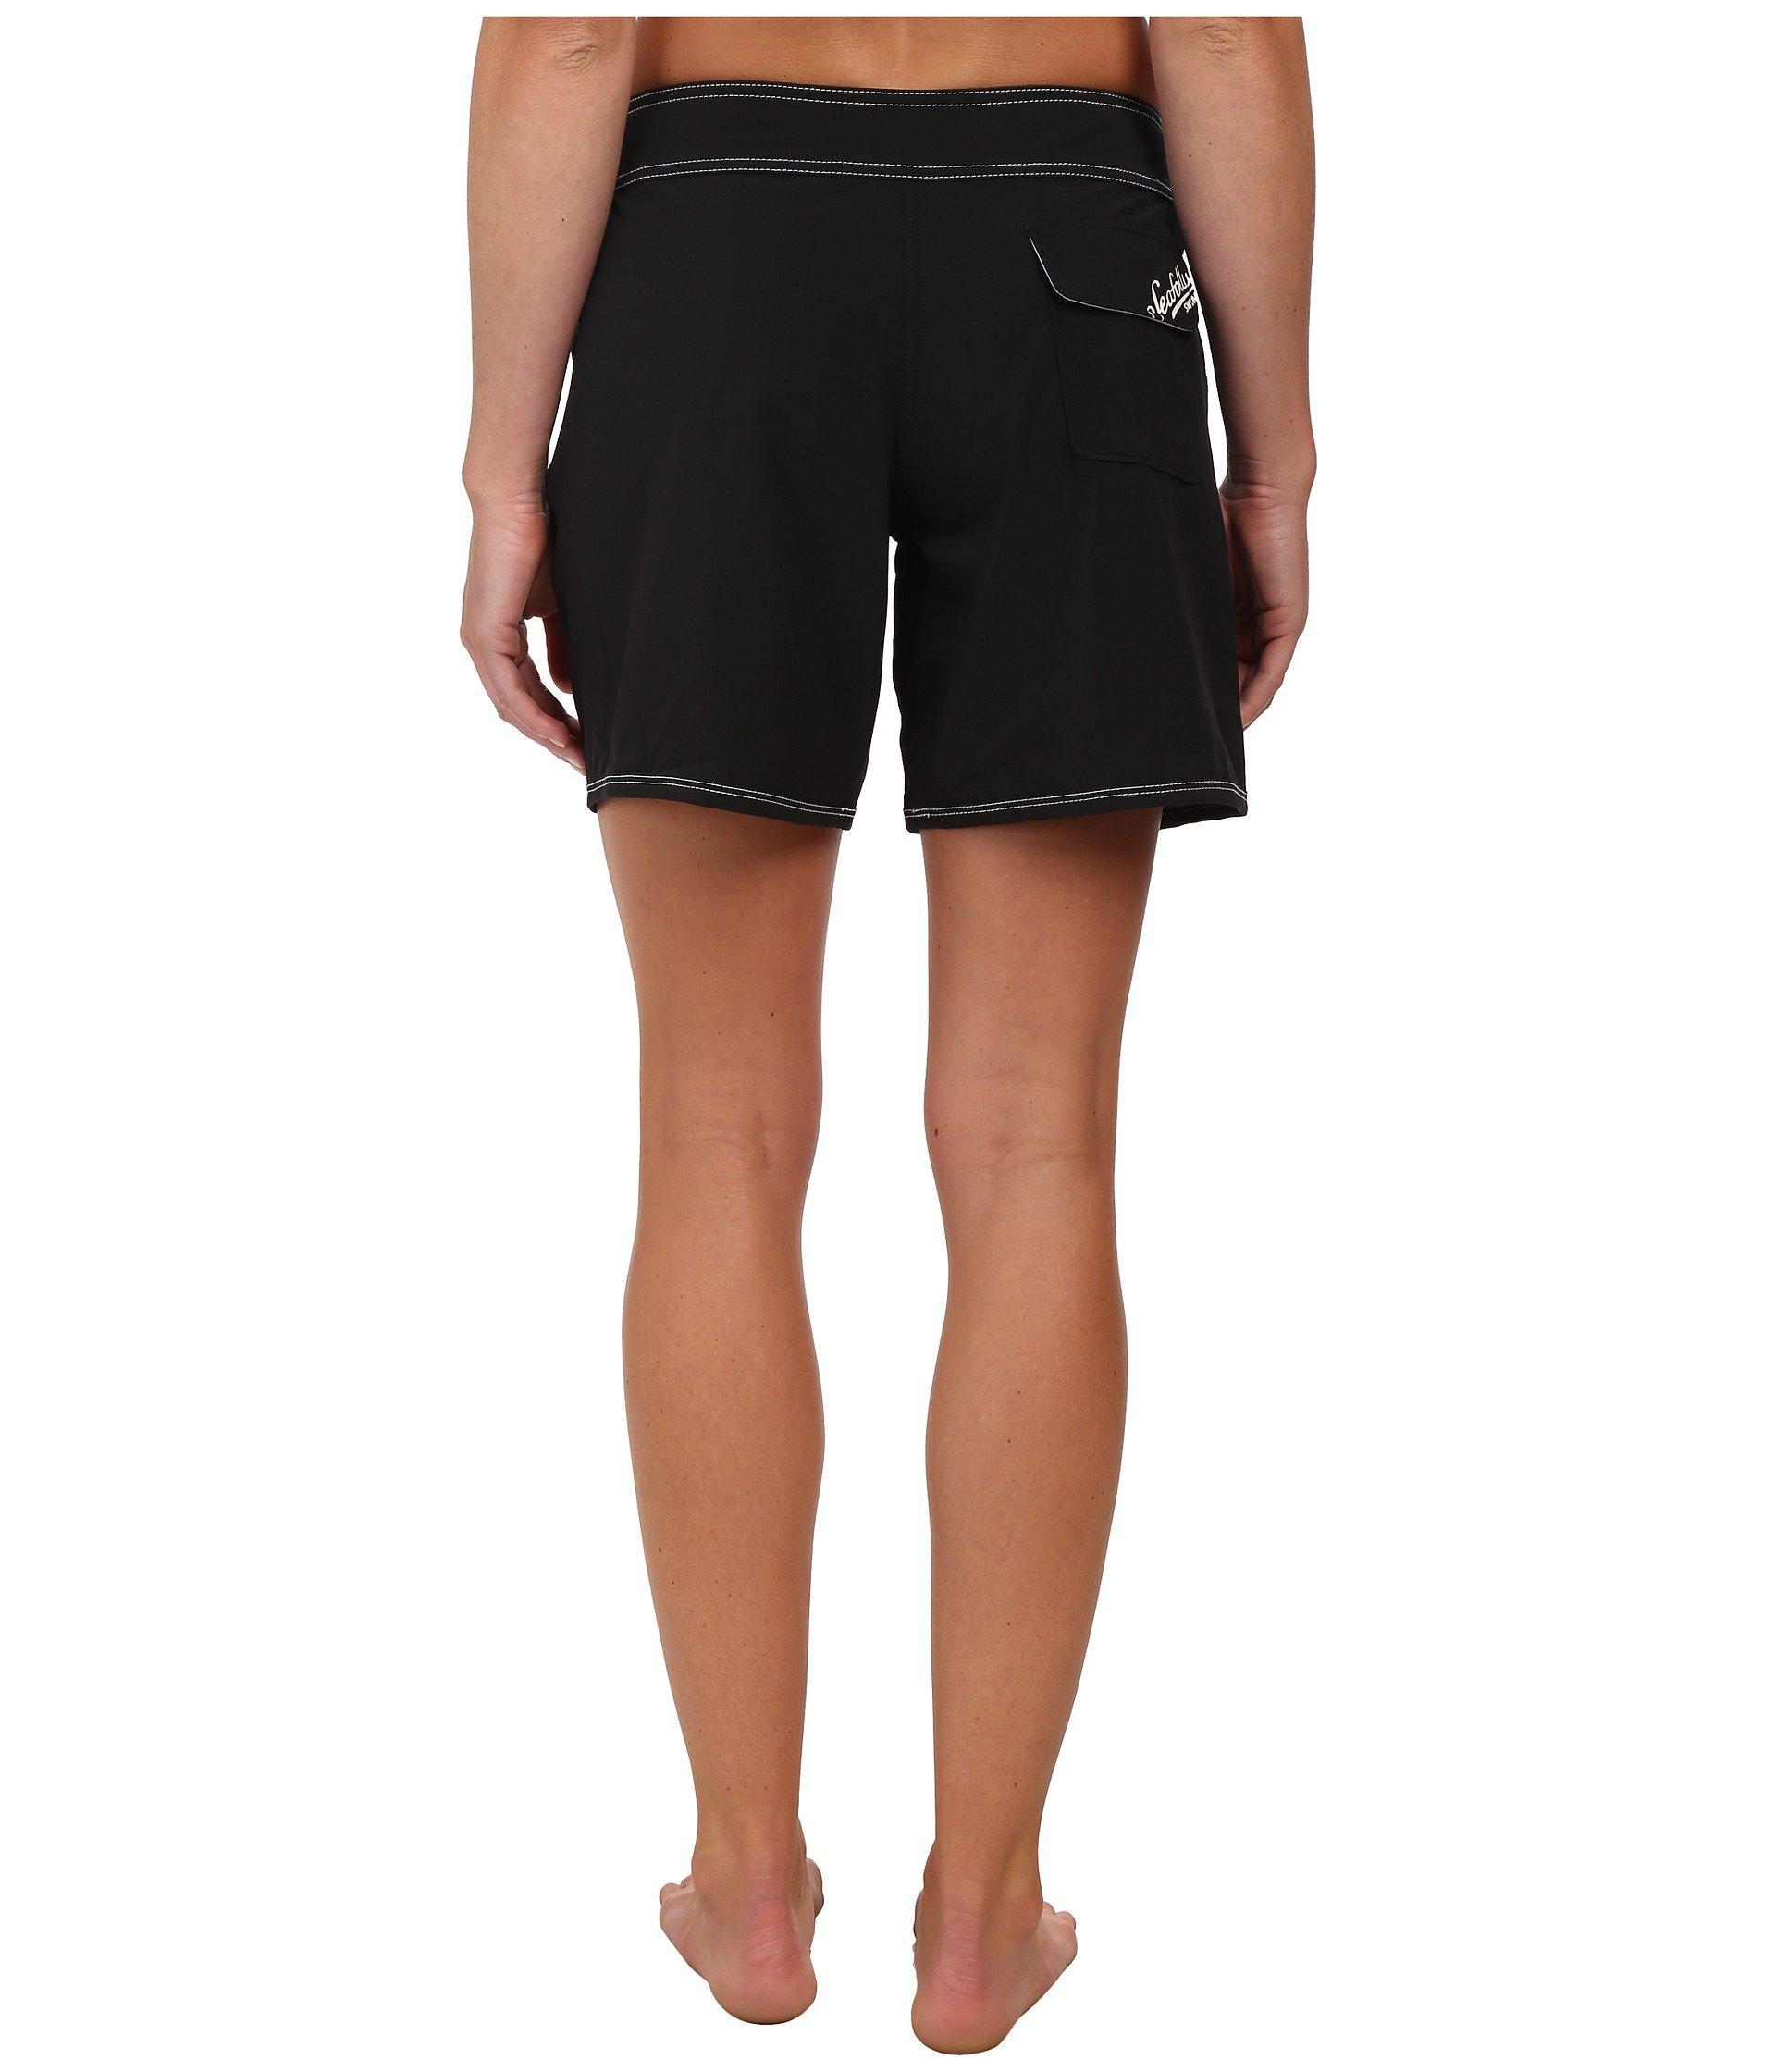 Seafolly Womens Board Shorts